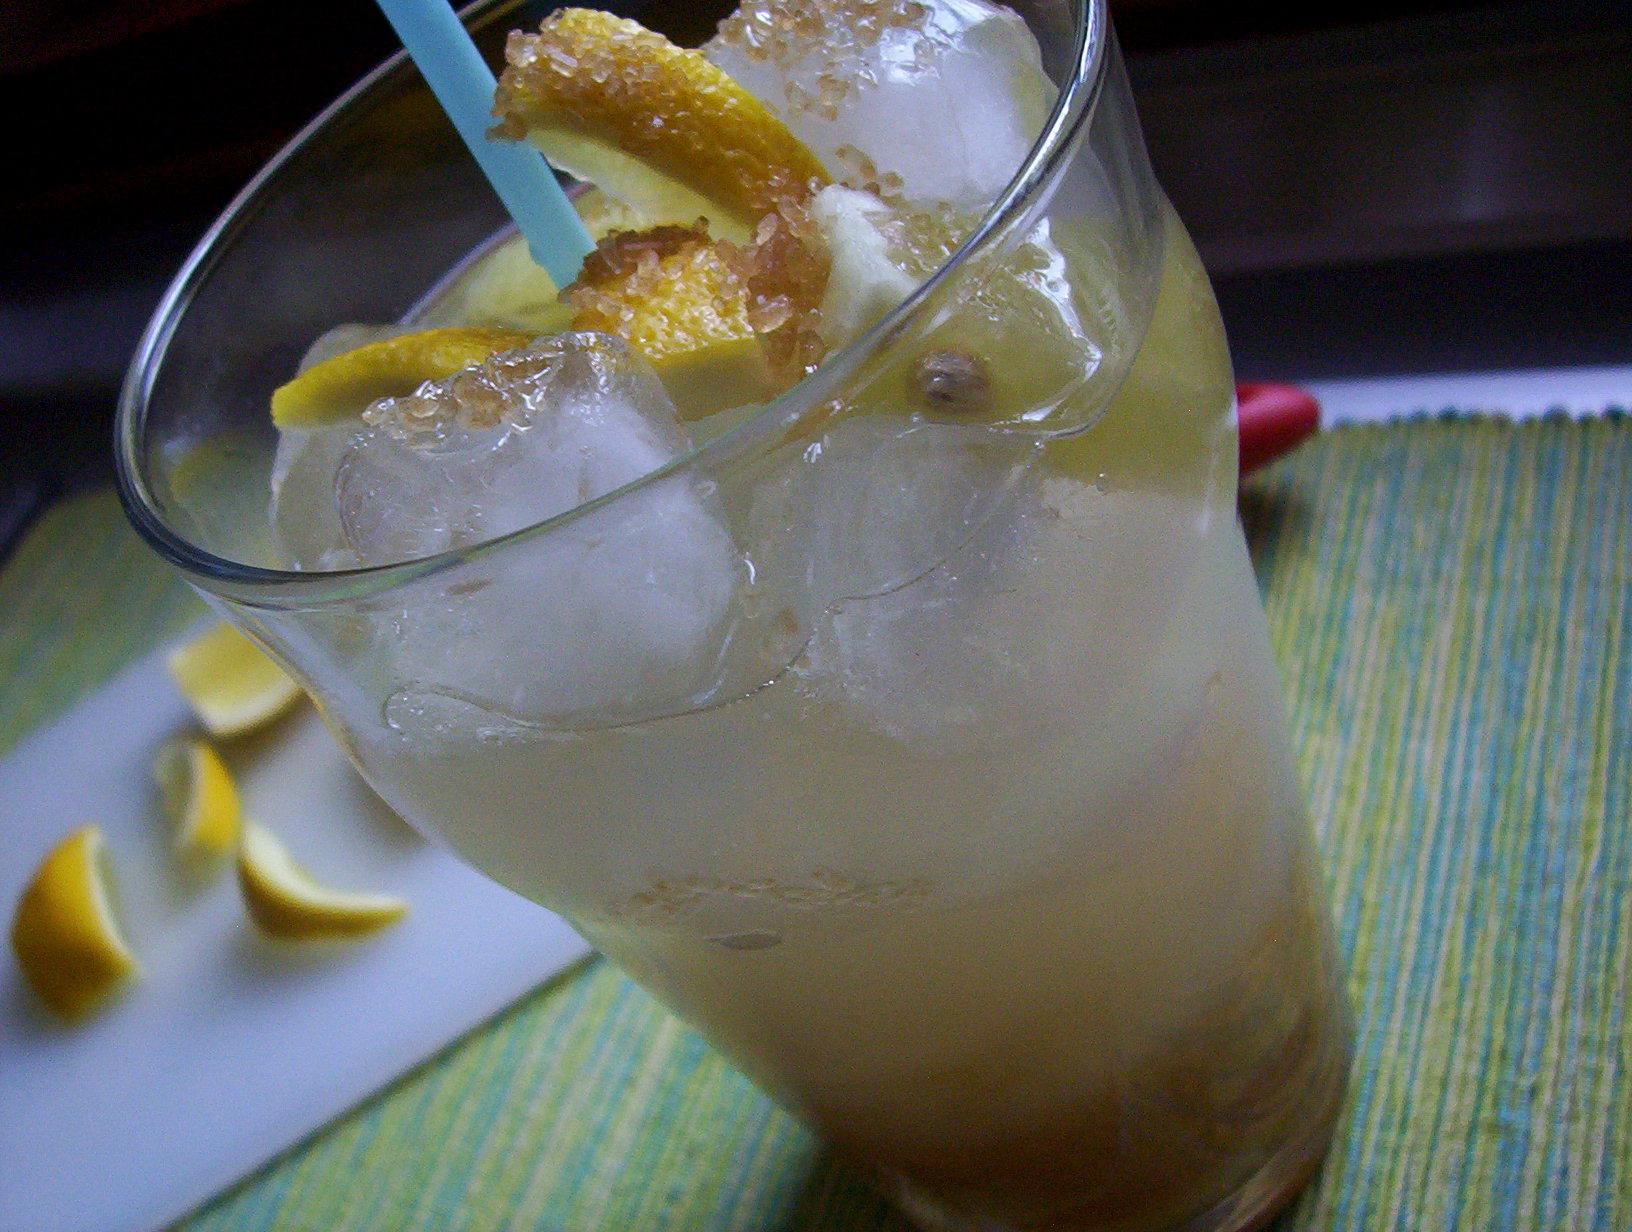 Sambuca lemon drink